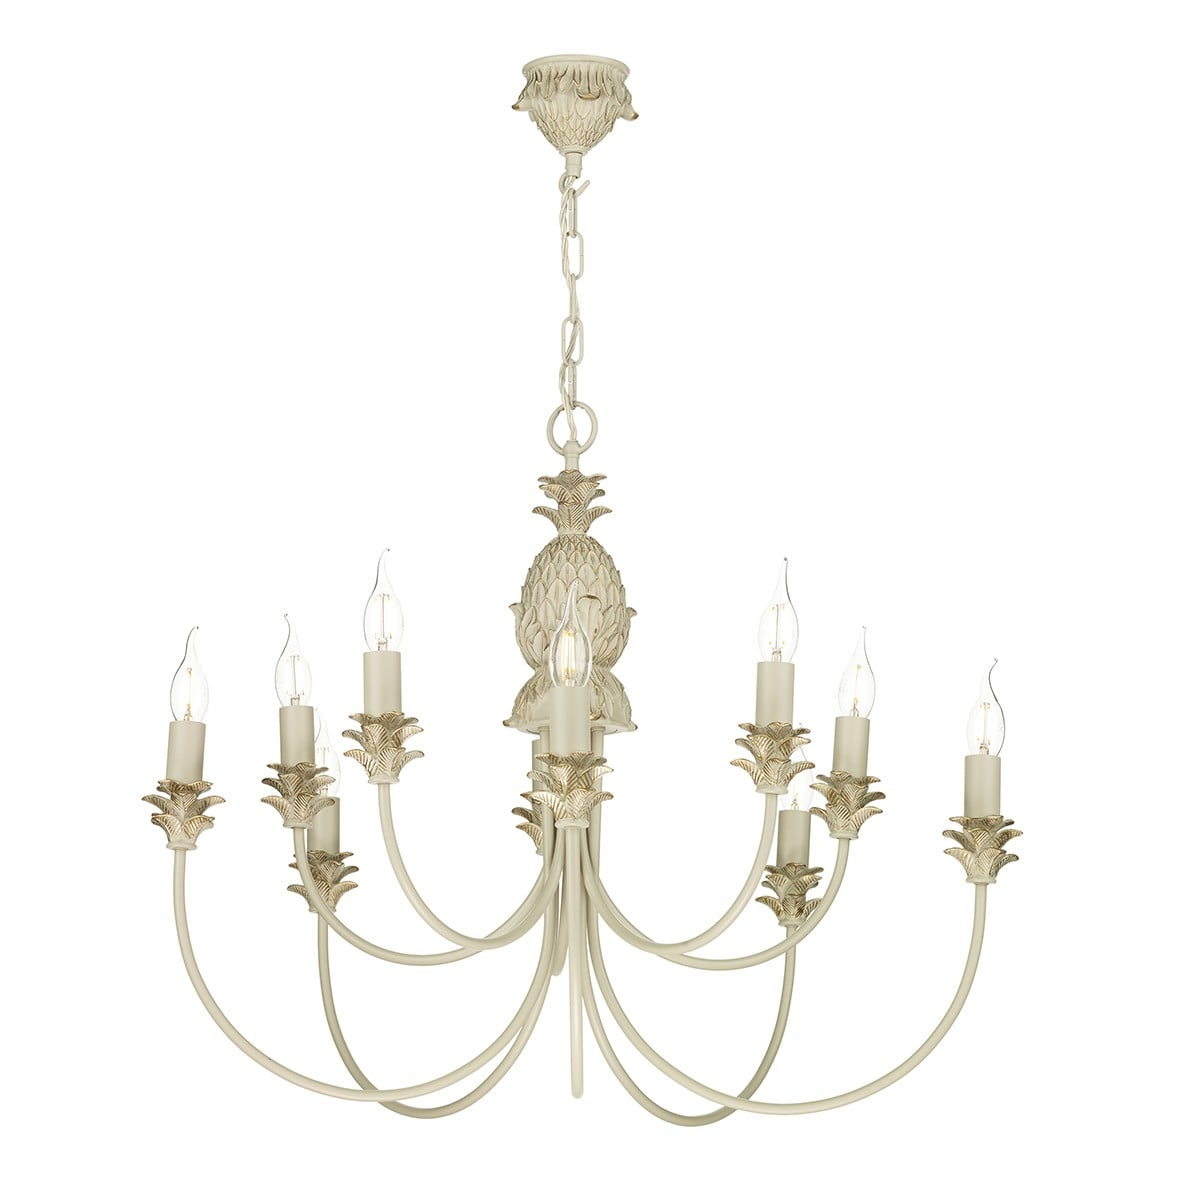 David Hunt Lighting CAB2312 Cabana 10 light pendant, Cream|Gold